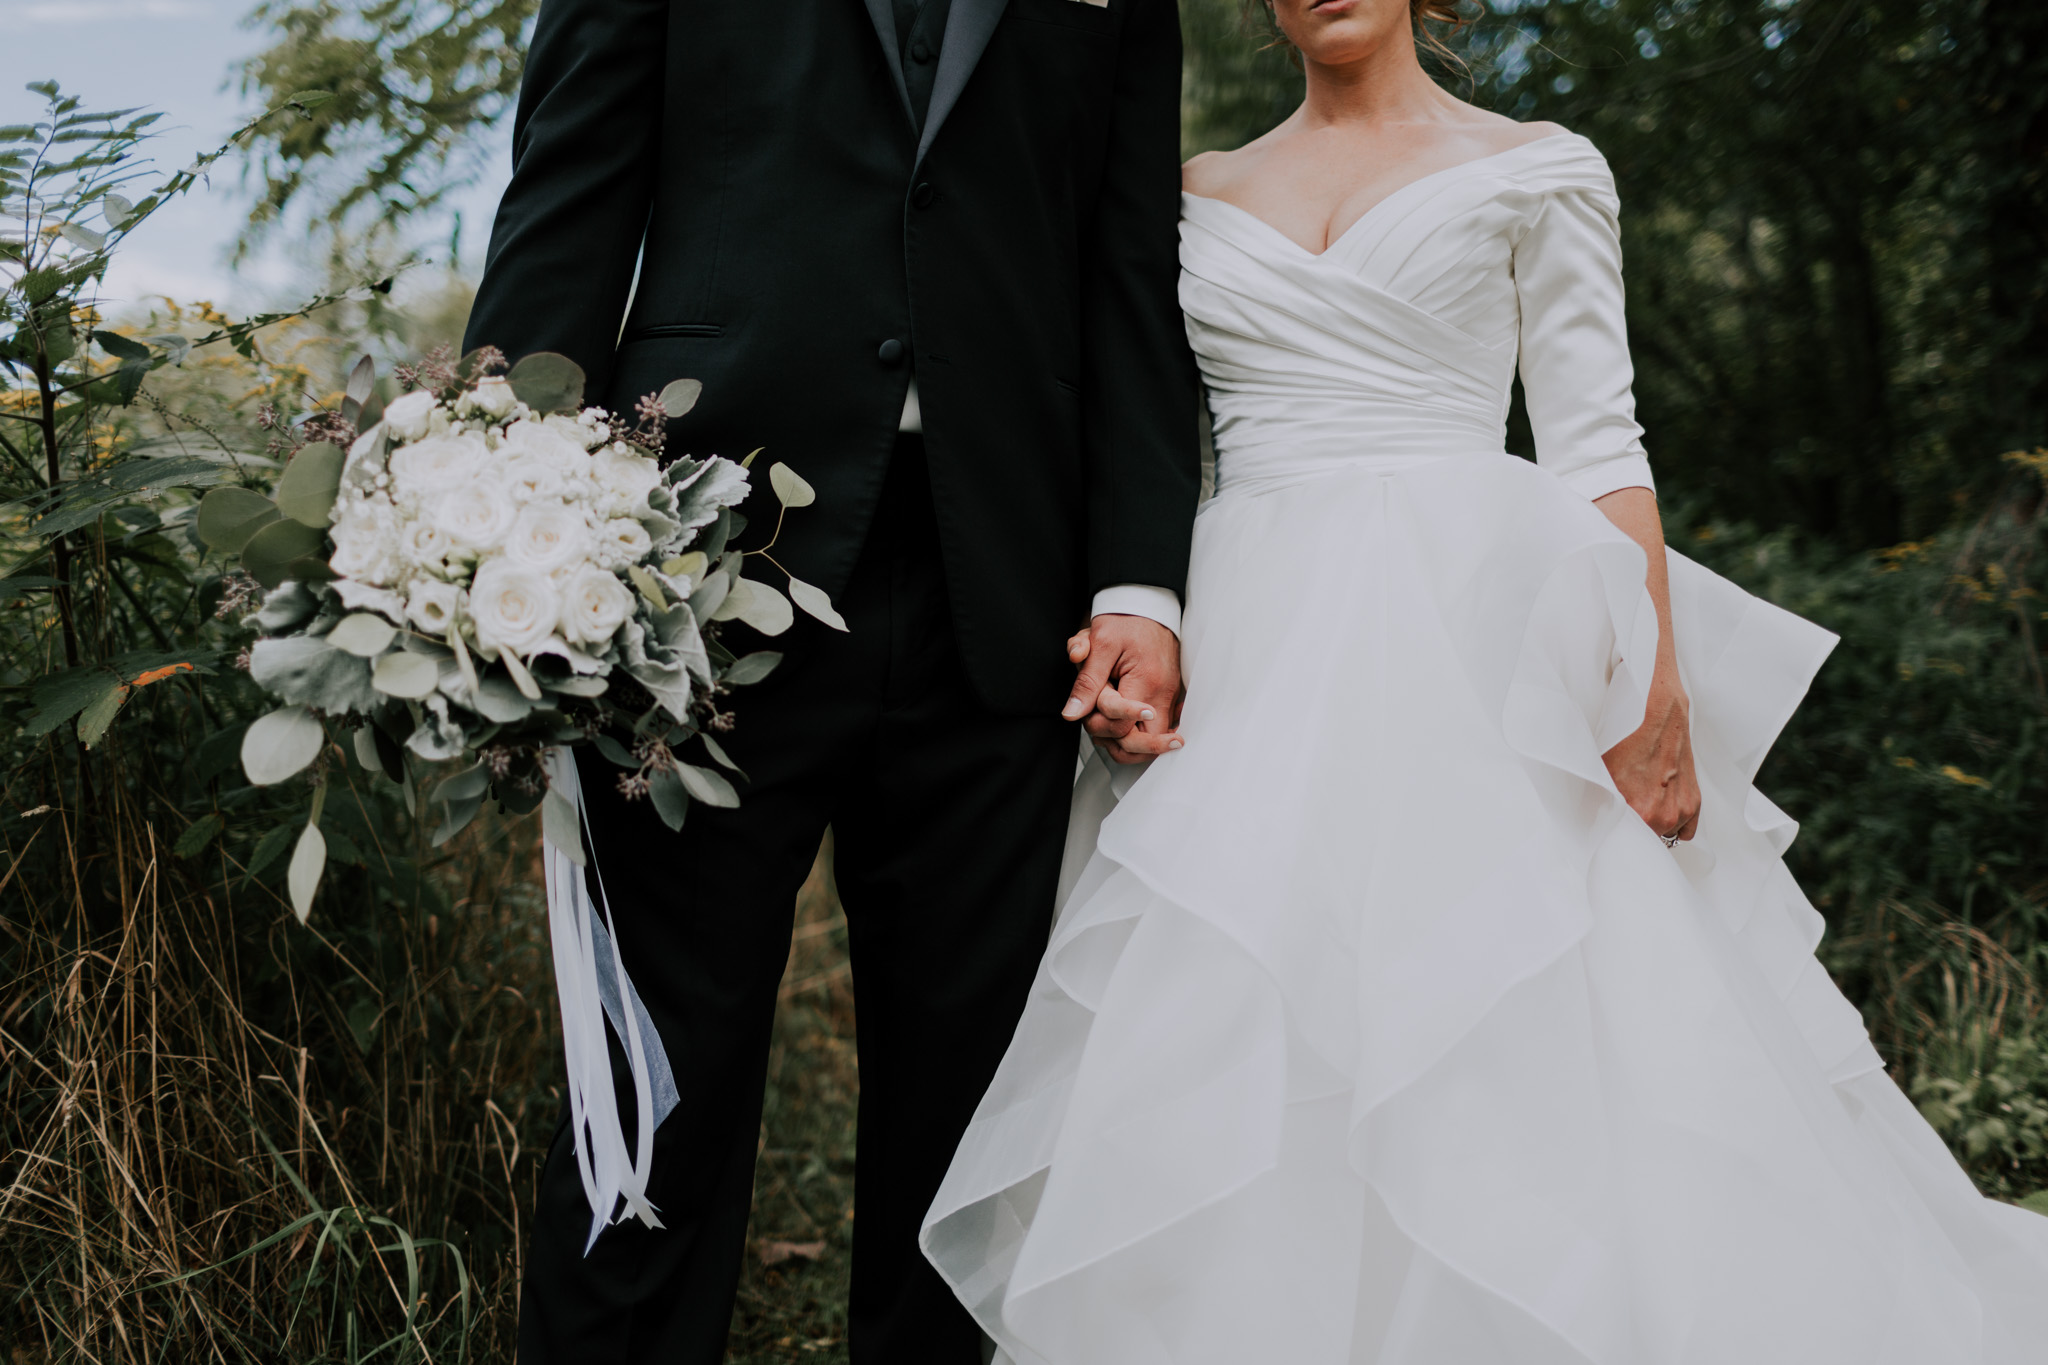 MillCreek-Wilde-Wedding-Barn-Michigan-Eliza-Eric-Vafa-Photo402.jpg